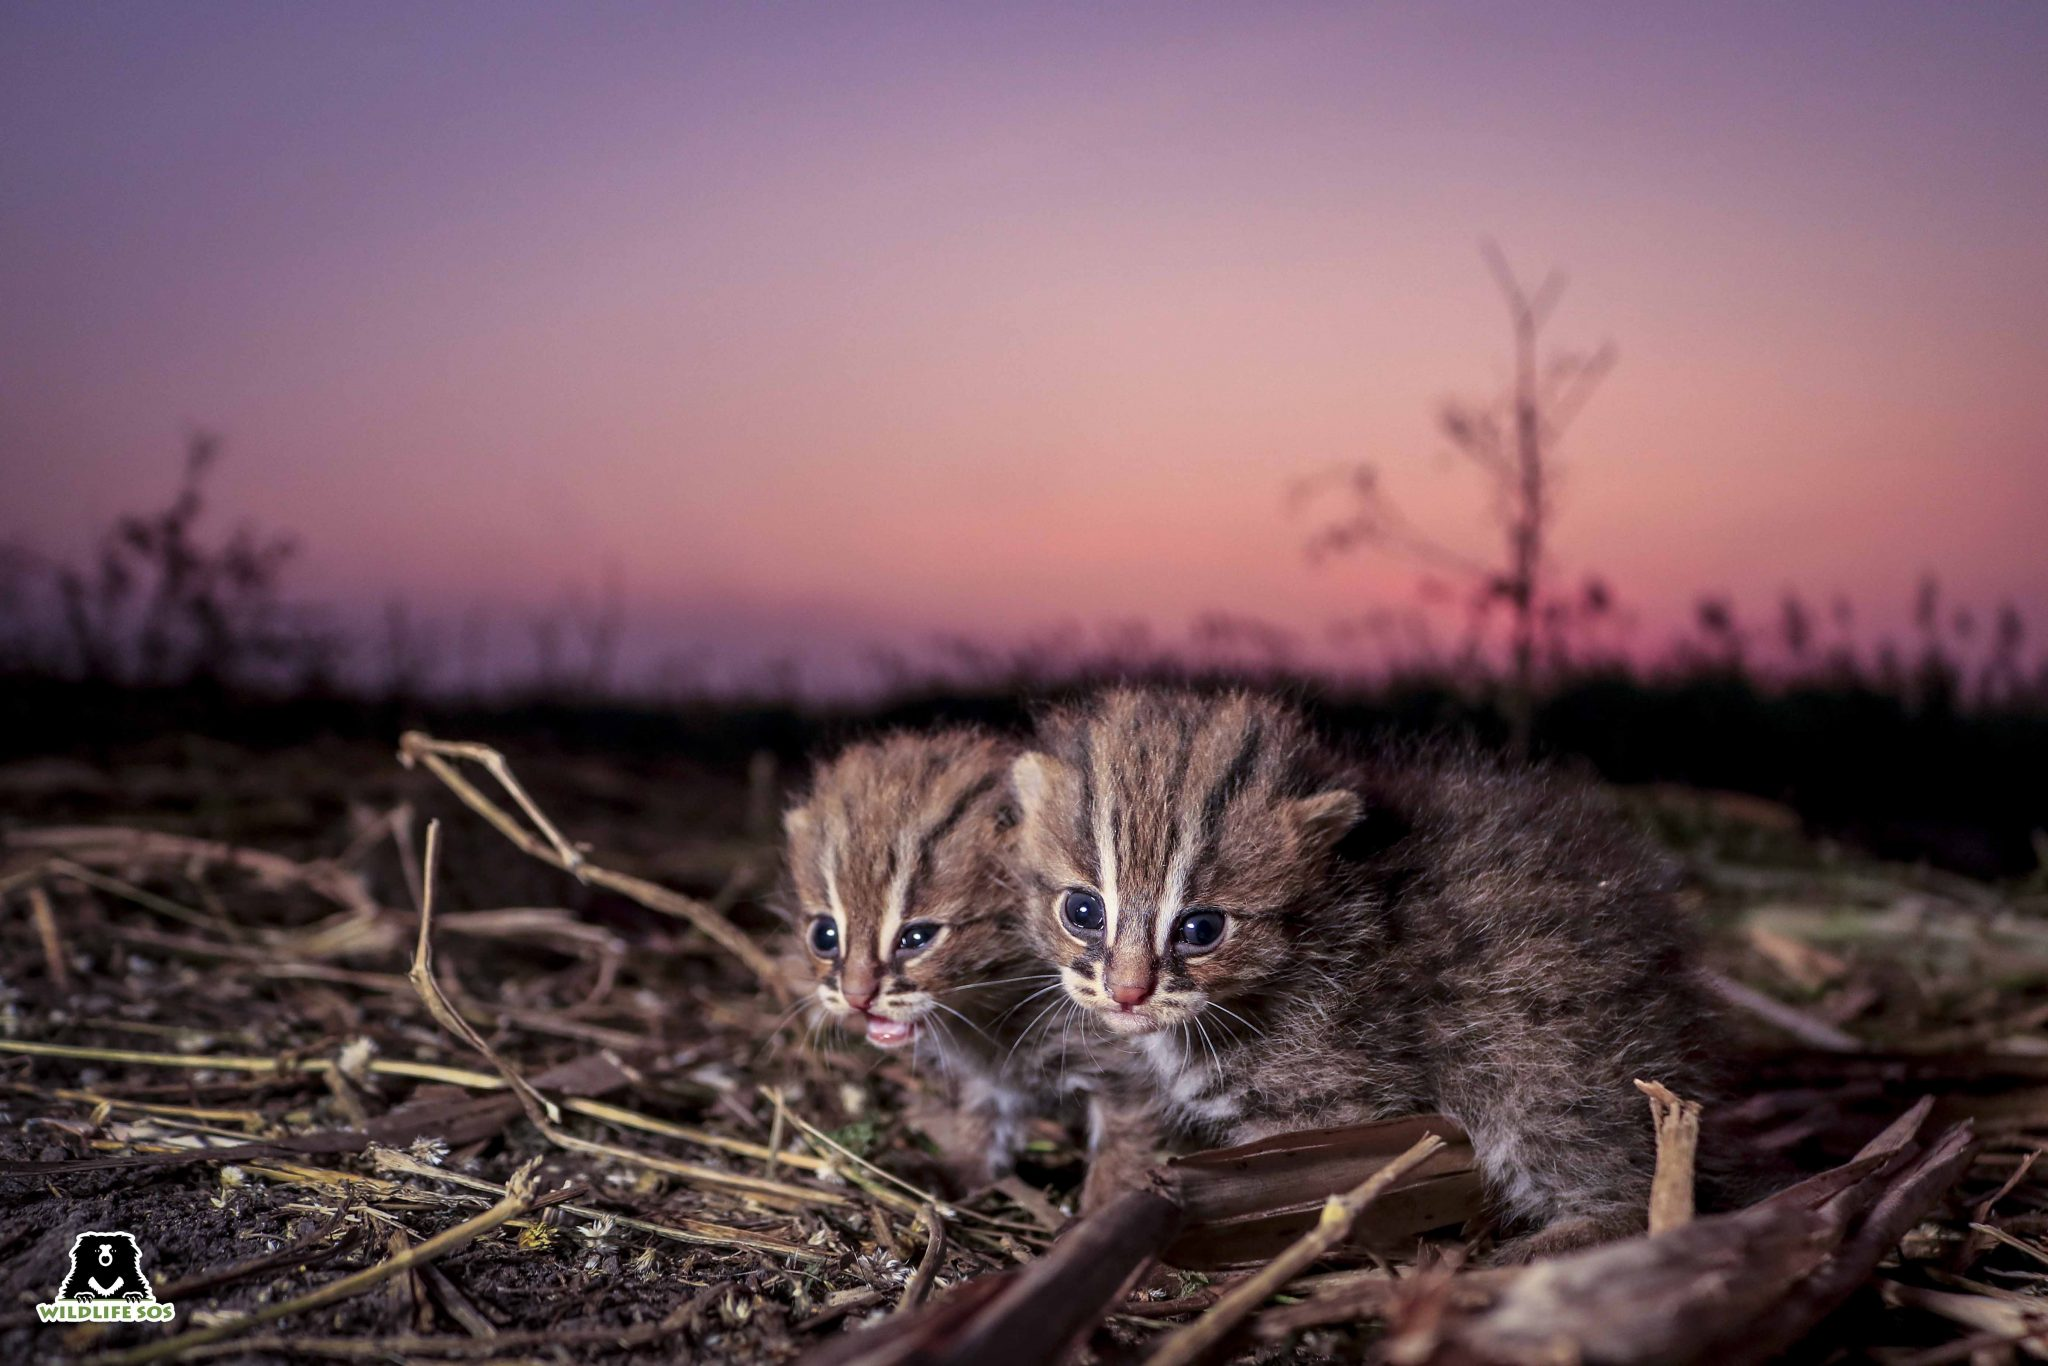 Courtesy of Wildlife SOS